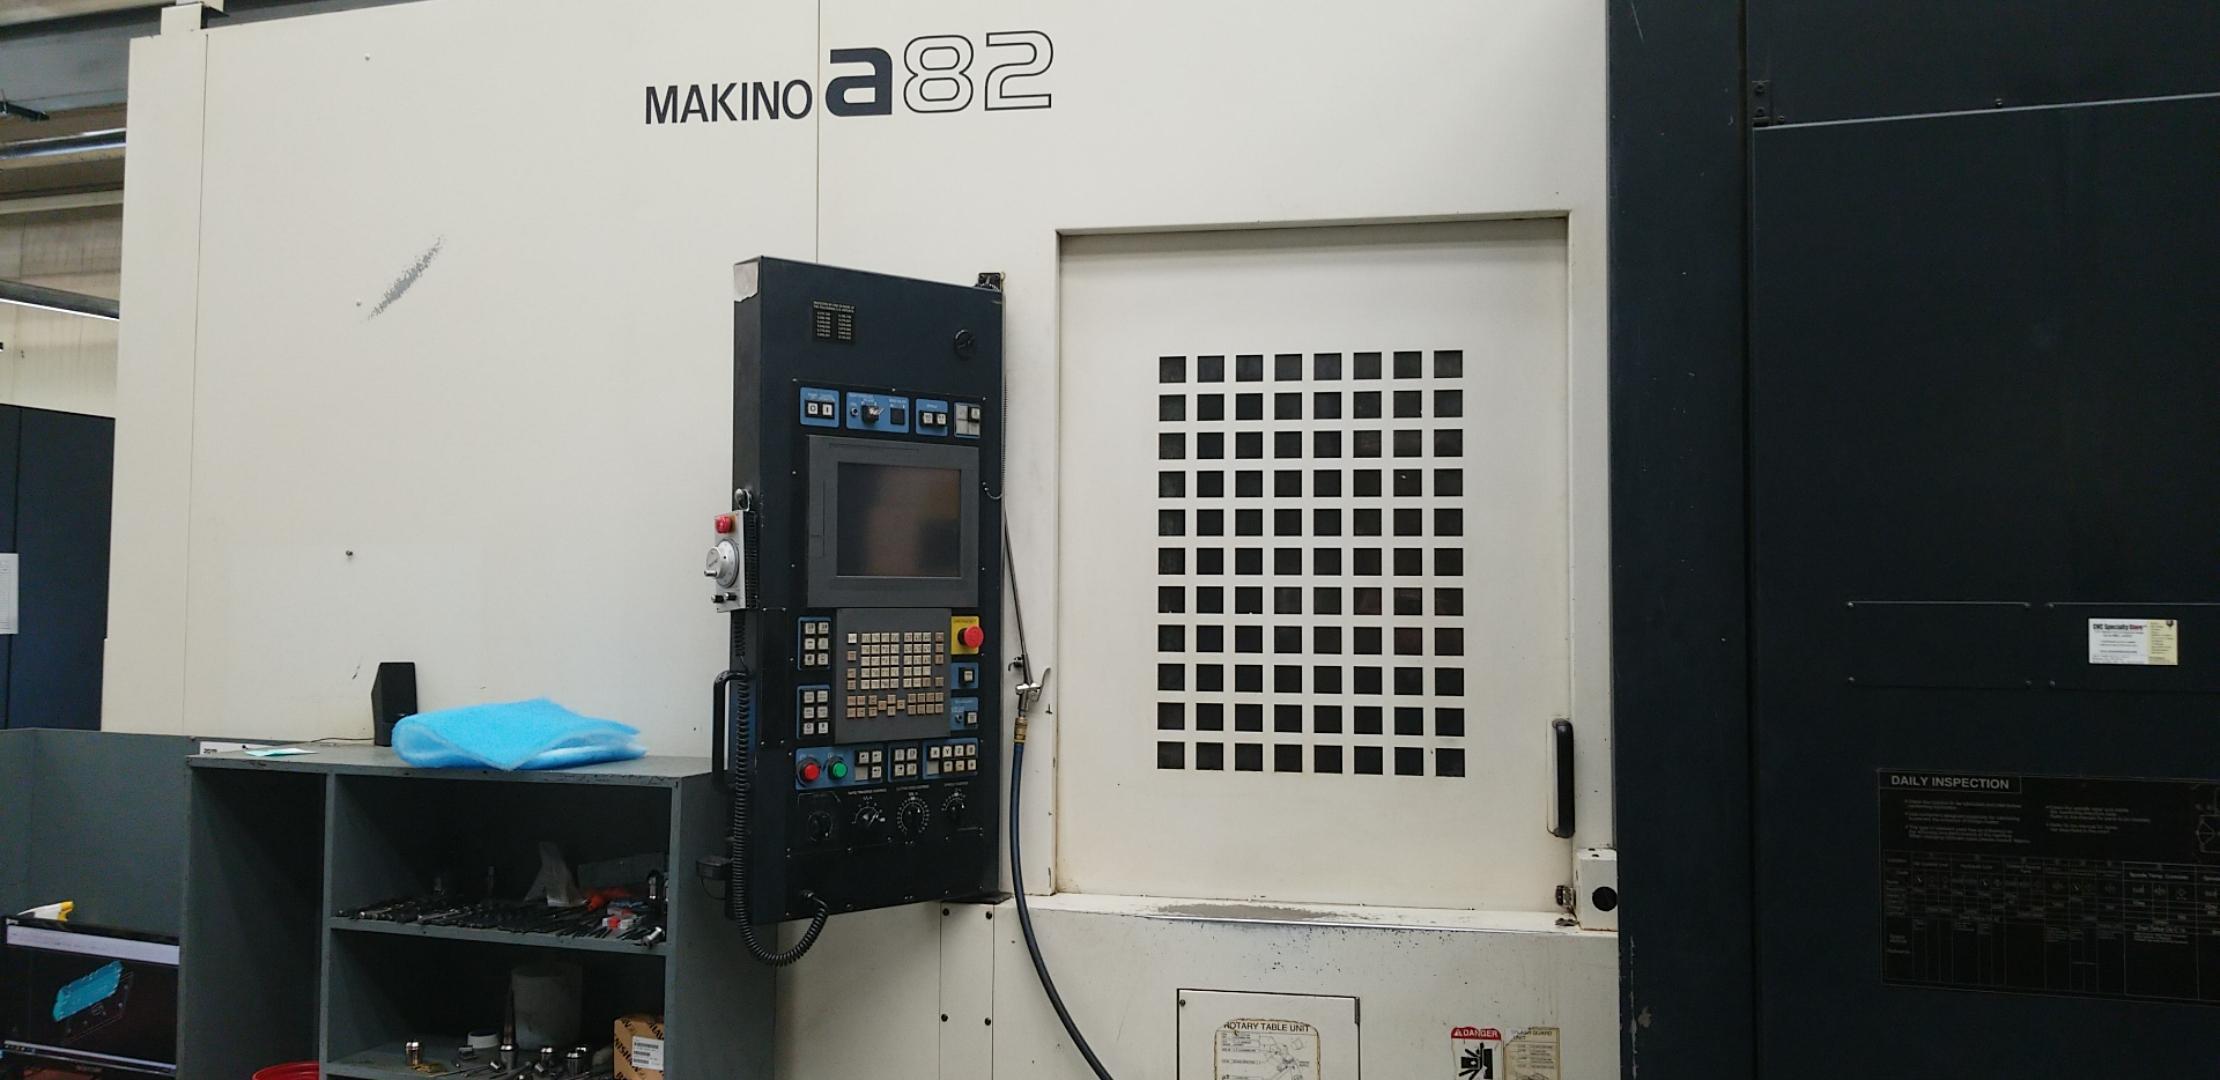 2009 Makino A82 - Horizontal Machining Center